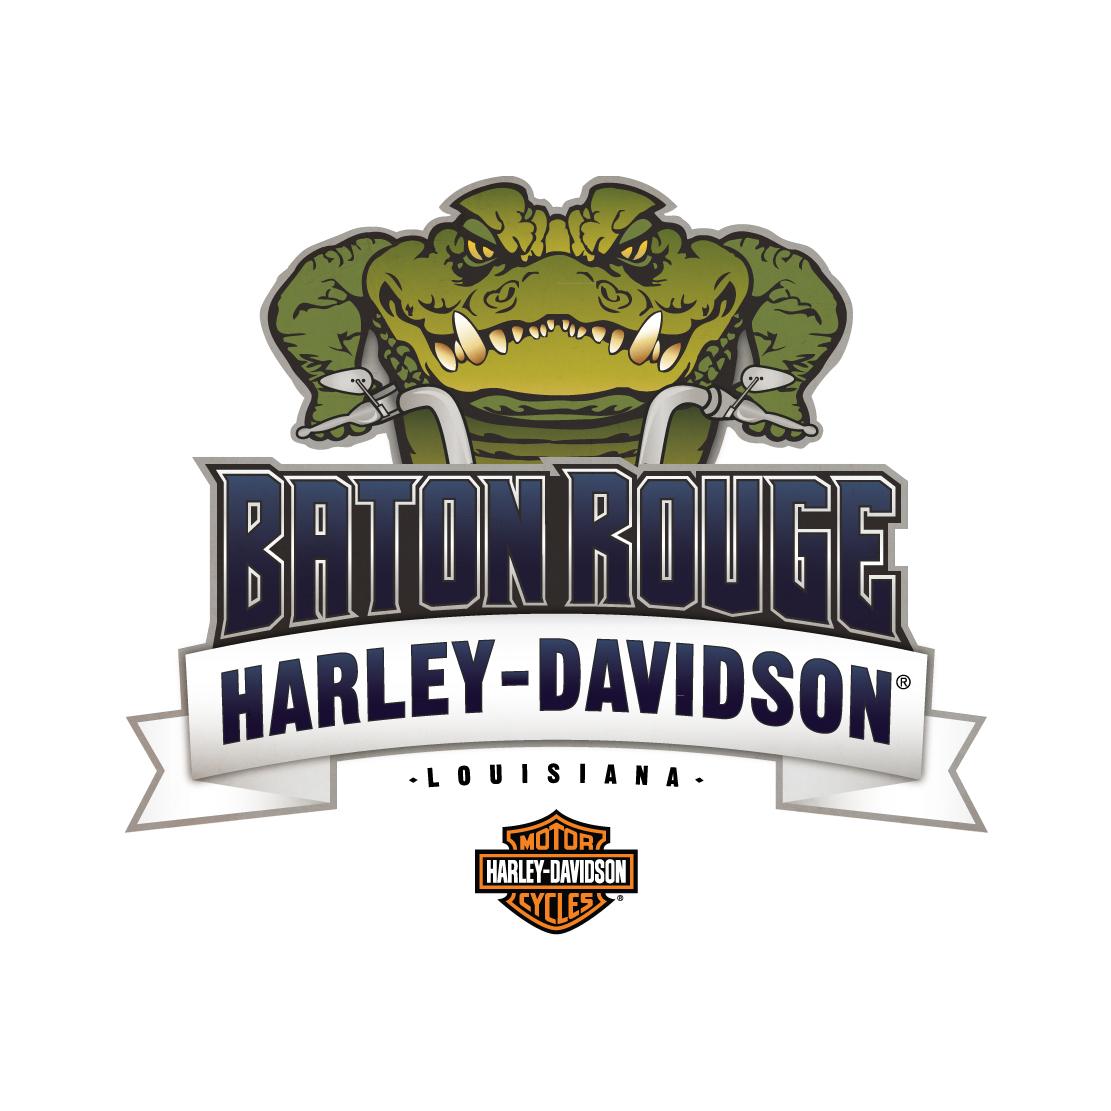 Baton Rouge Harley-Davidson - Baton Rouge, LA 70809 - (225) 292-9632 | ShowMeLocal.com